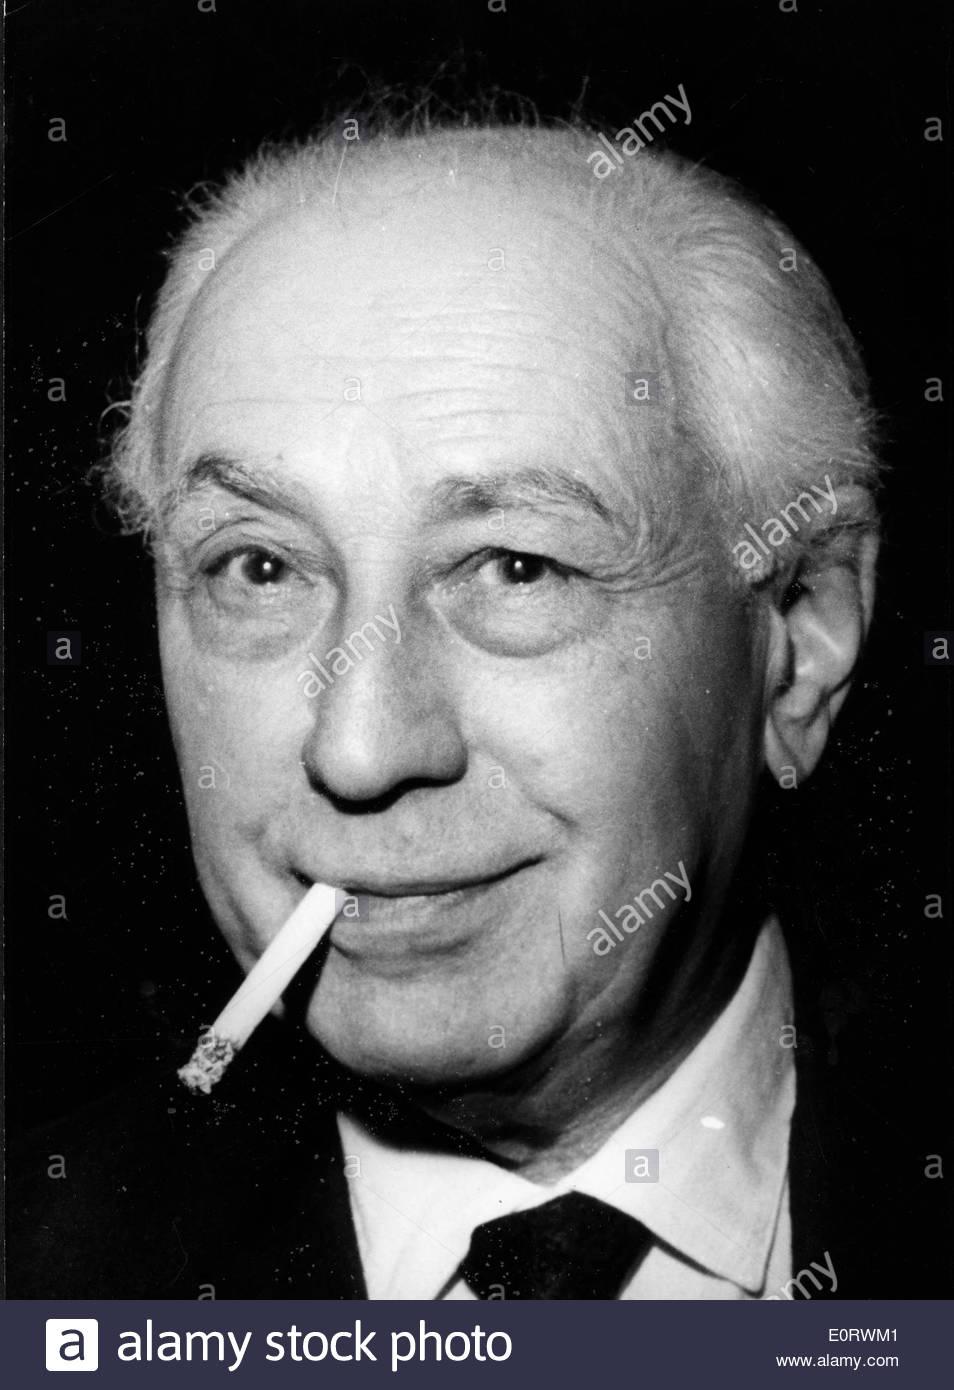 Director Abel Gance smokes a cigarette